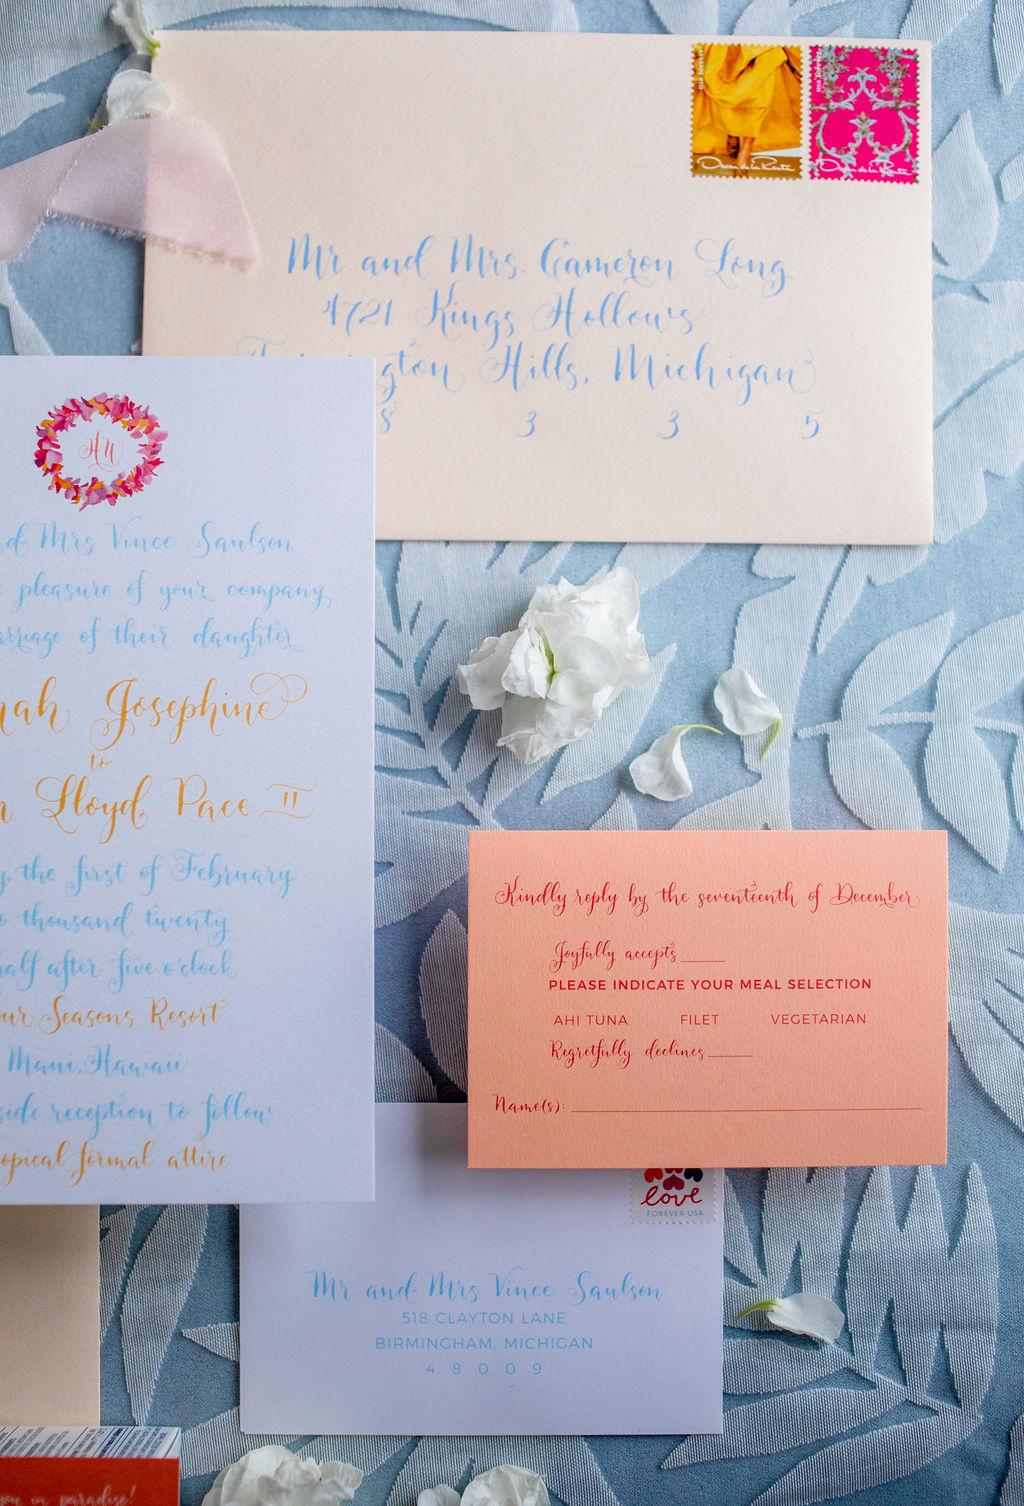 Tropical wedding invitation - Oscar de la Renta stamps - 3 types of wedding invitations postage - Leah E. Moss Designs